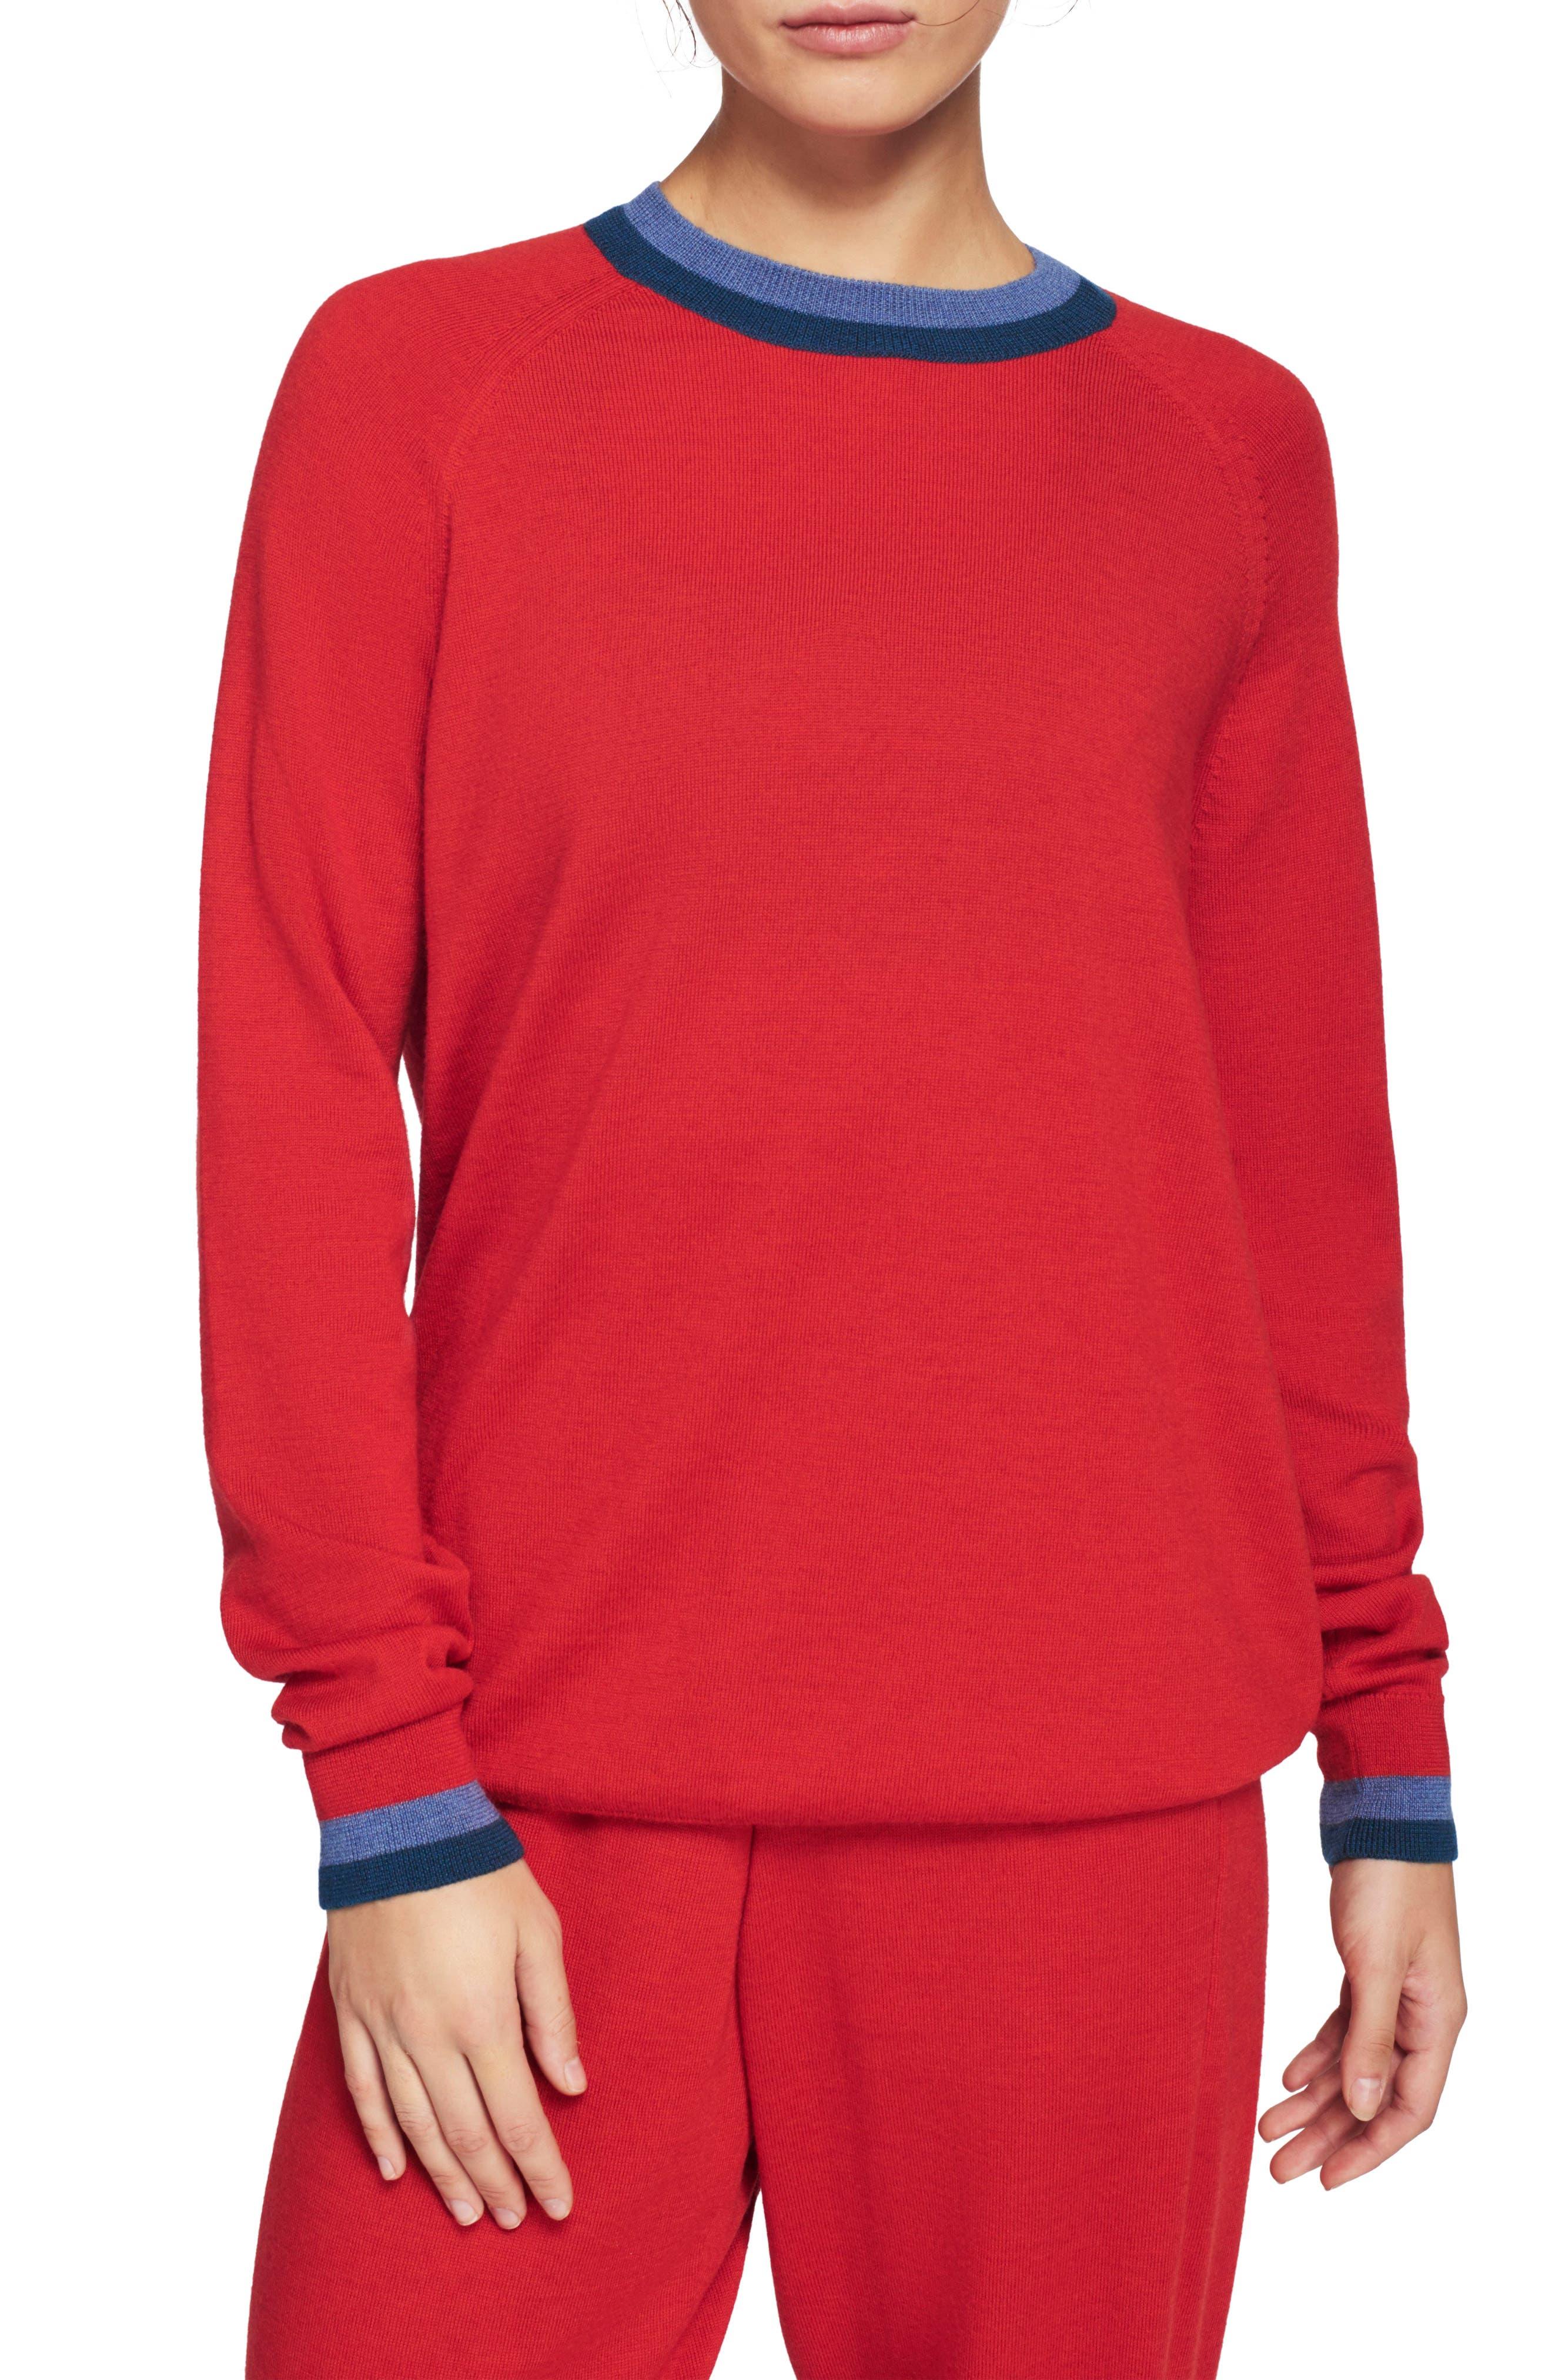 Lndr Chalet Merino Wool Sweatshirt, Red